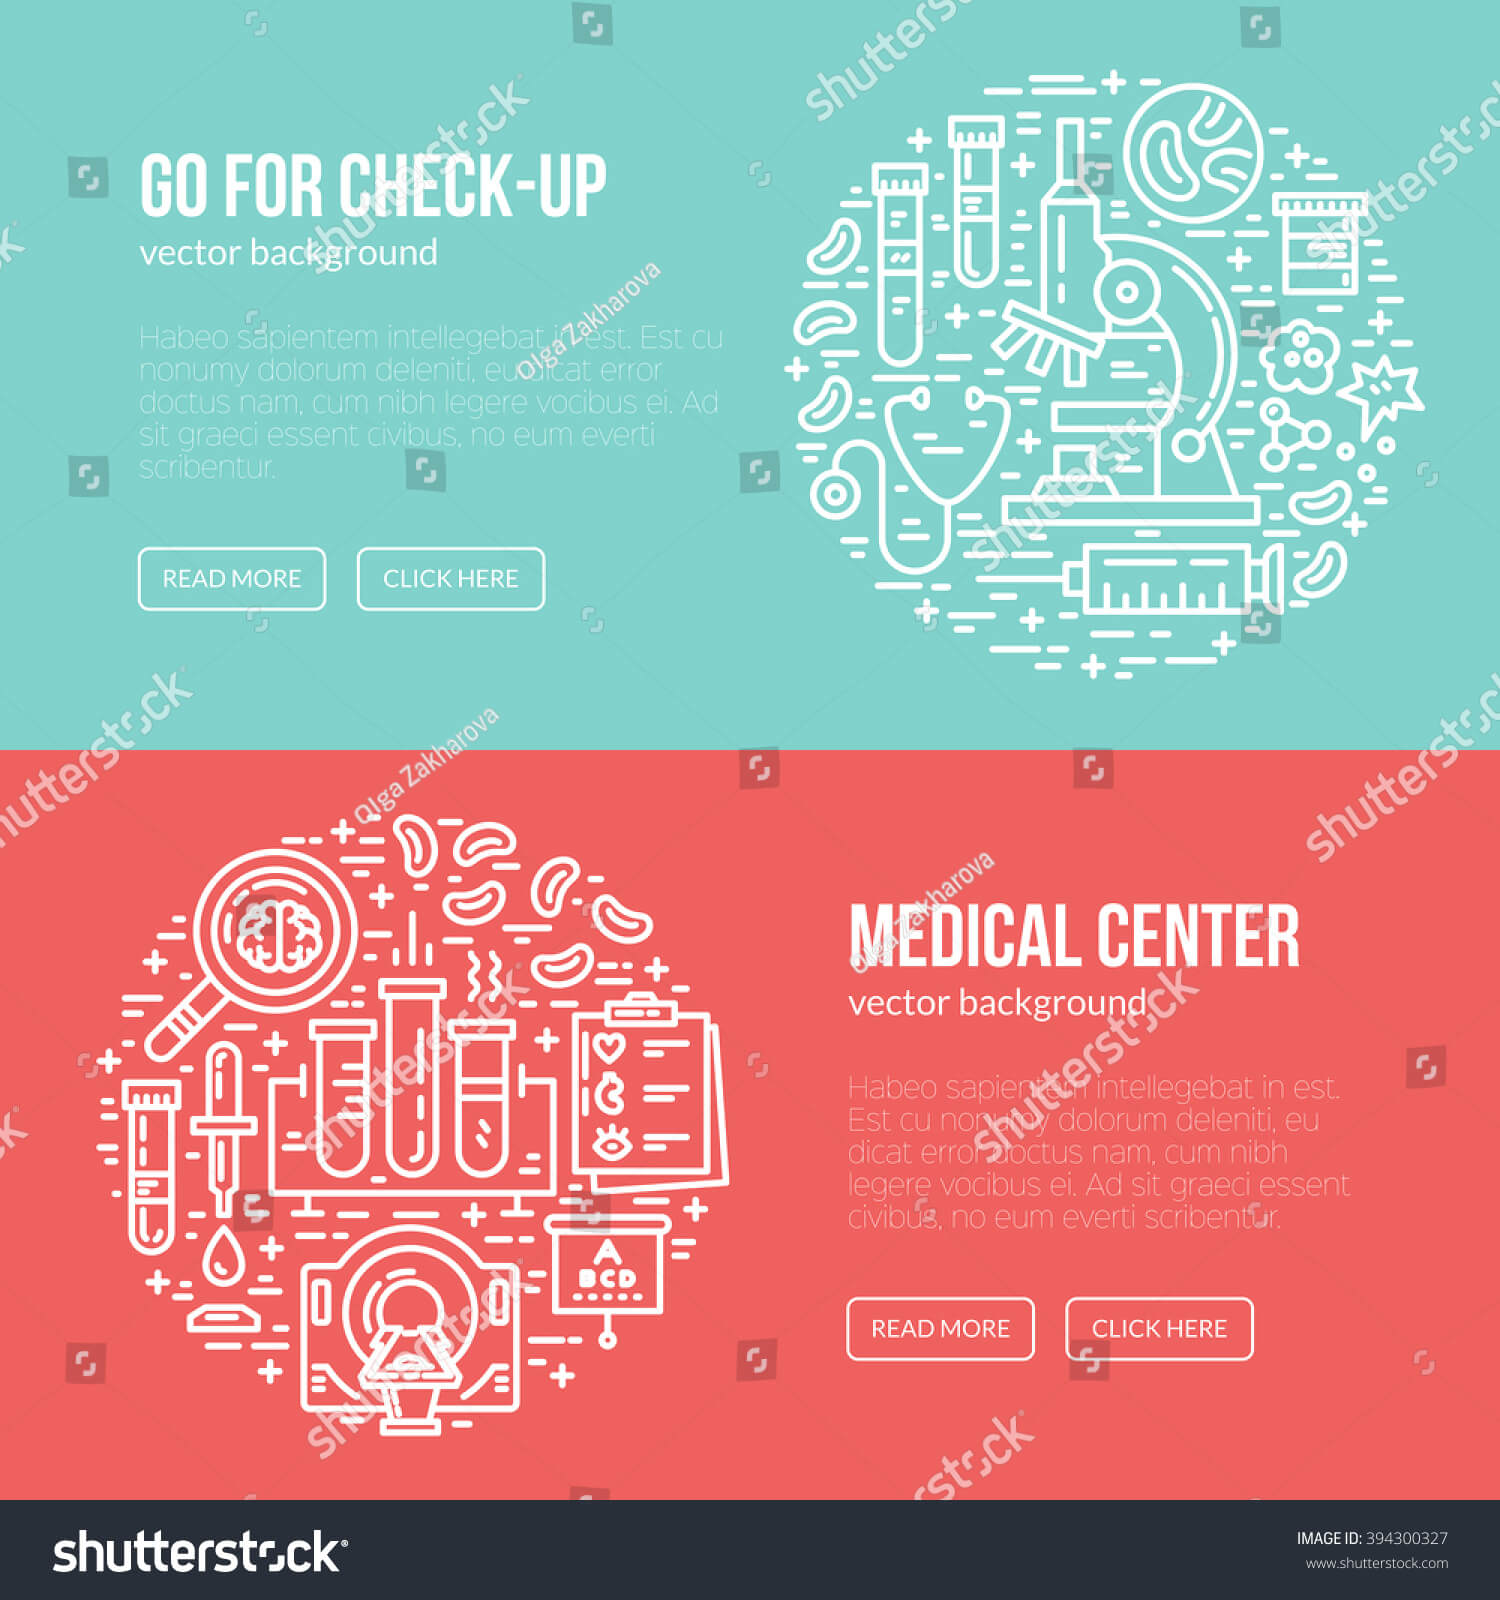 Medical Banner Design Template Different Research Stock With Medical Banner Template